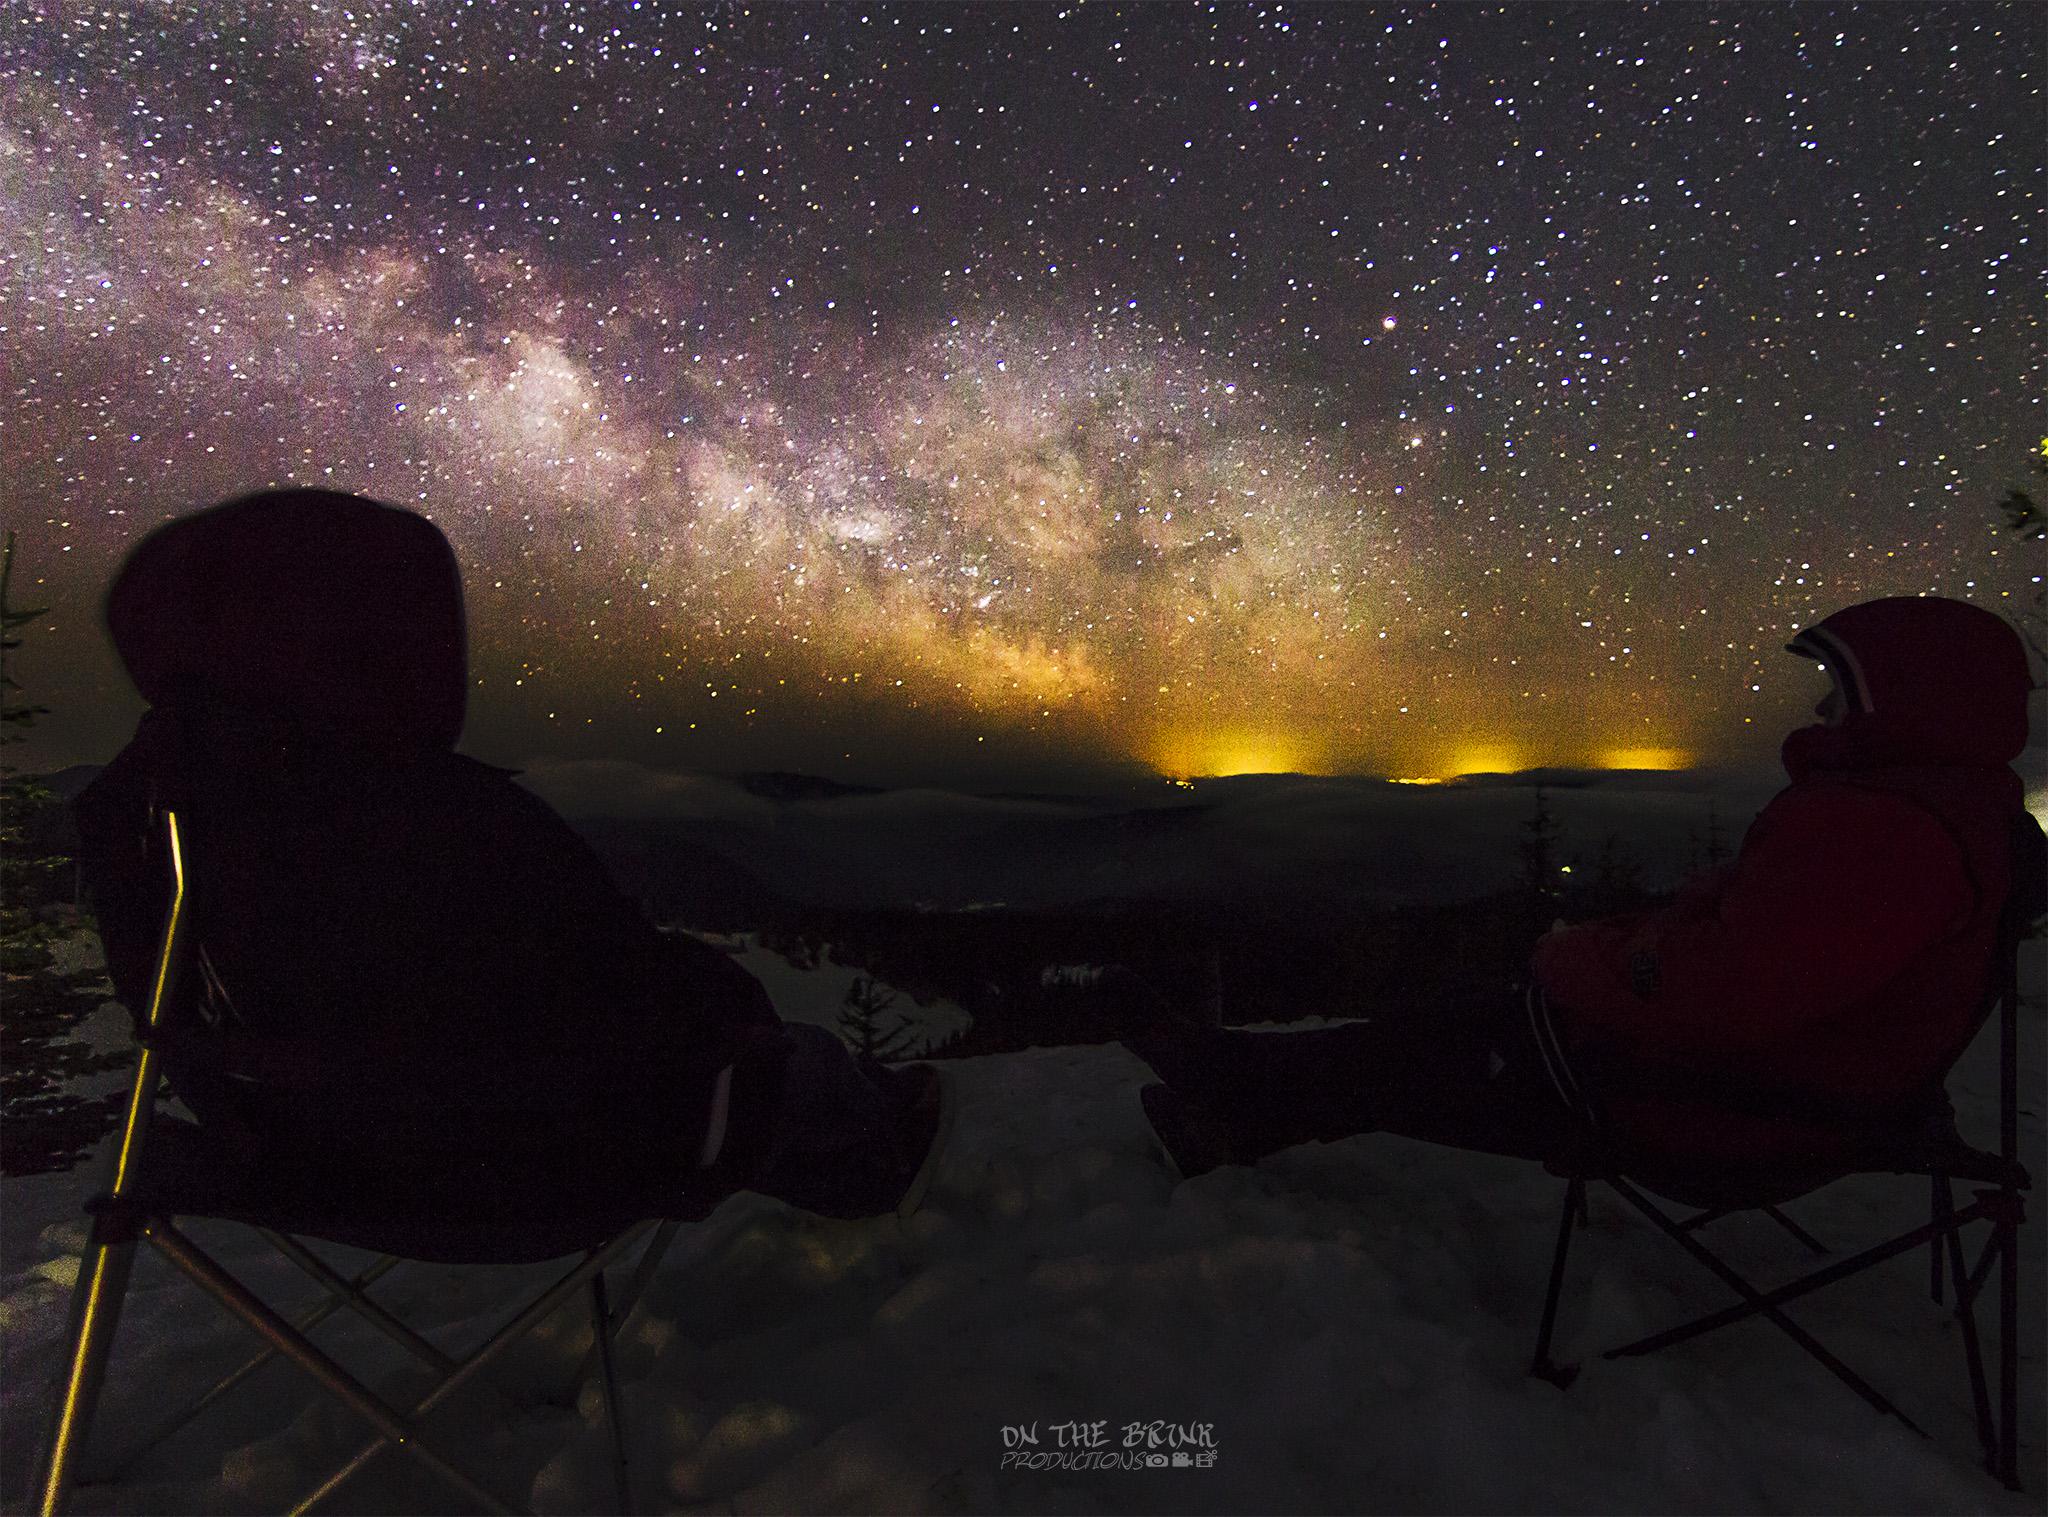 Soaking in the MilkyWay